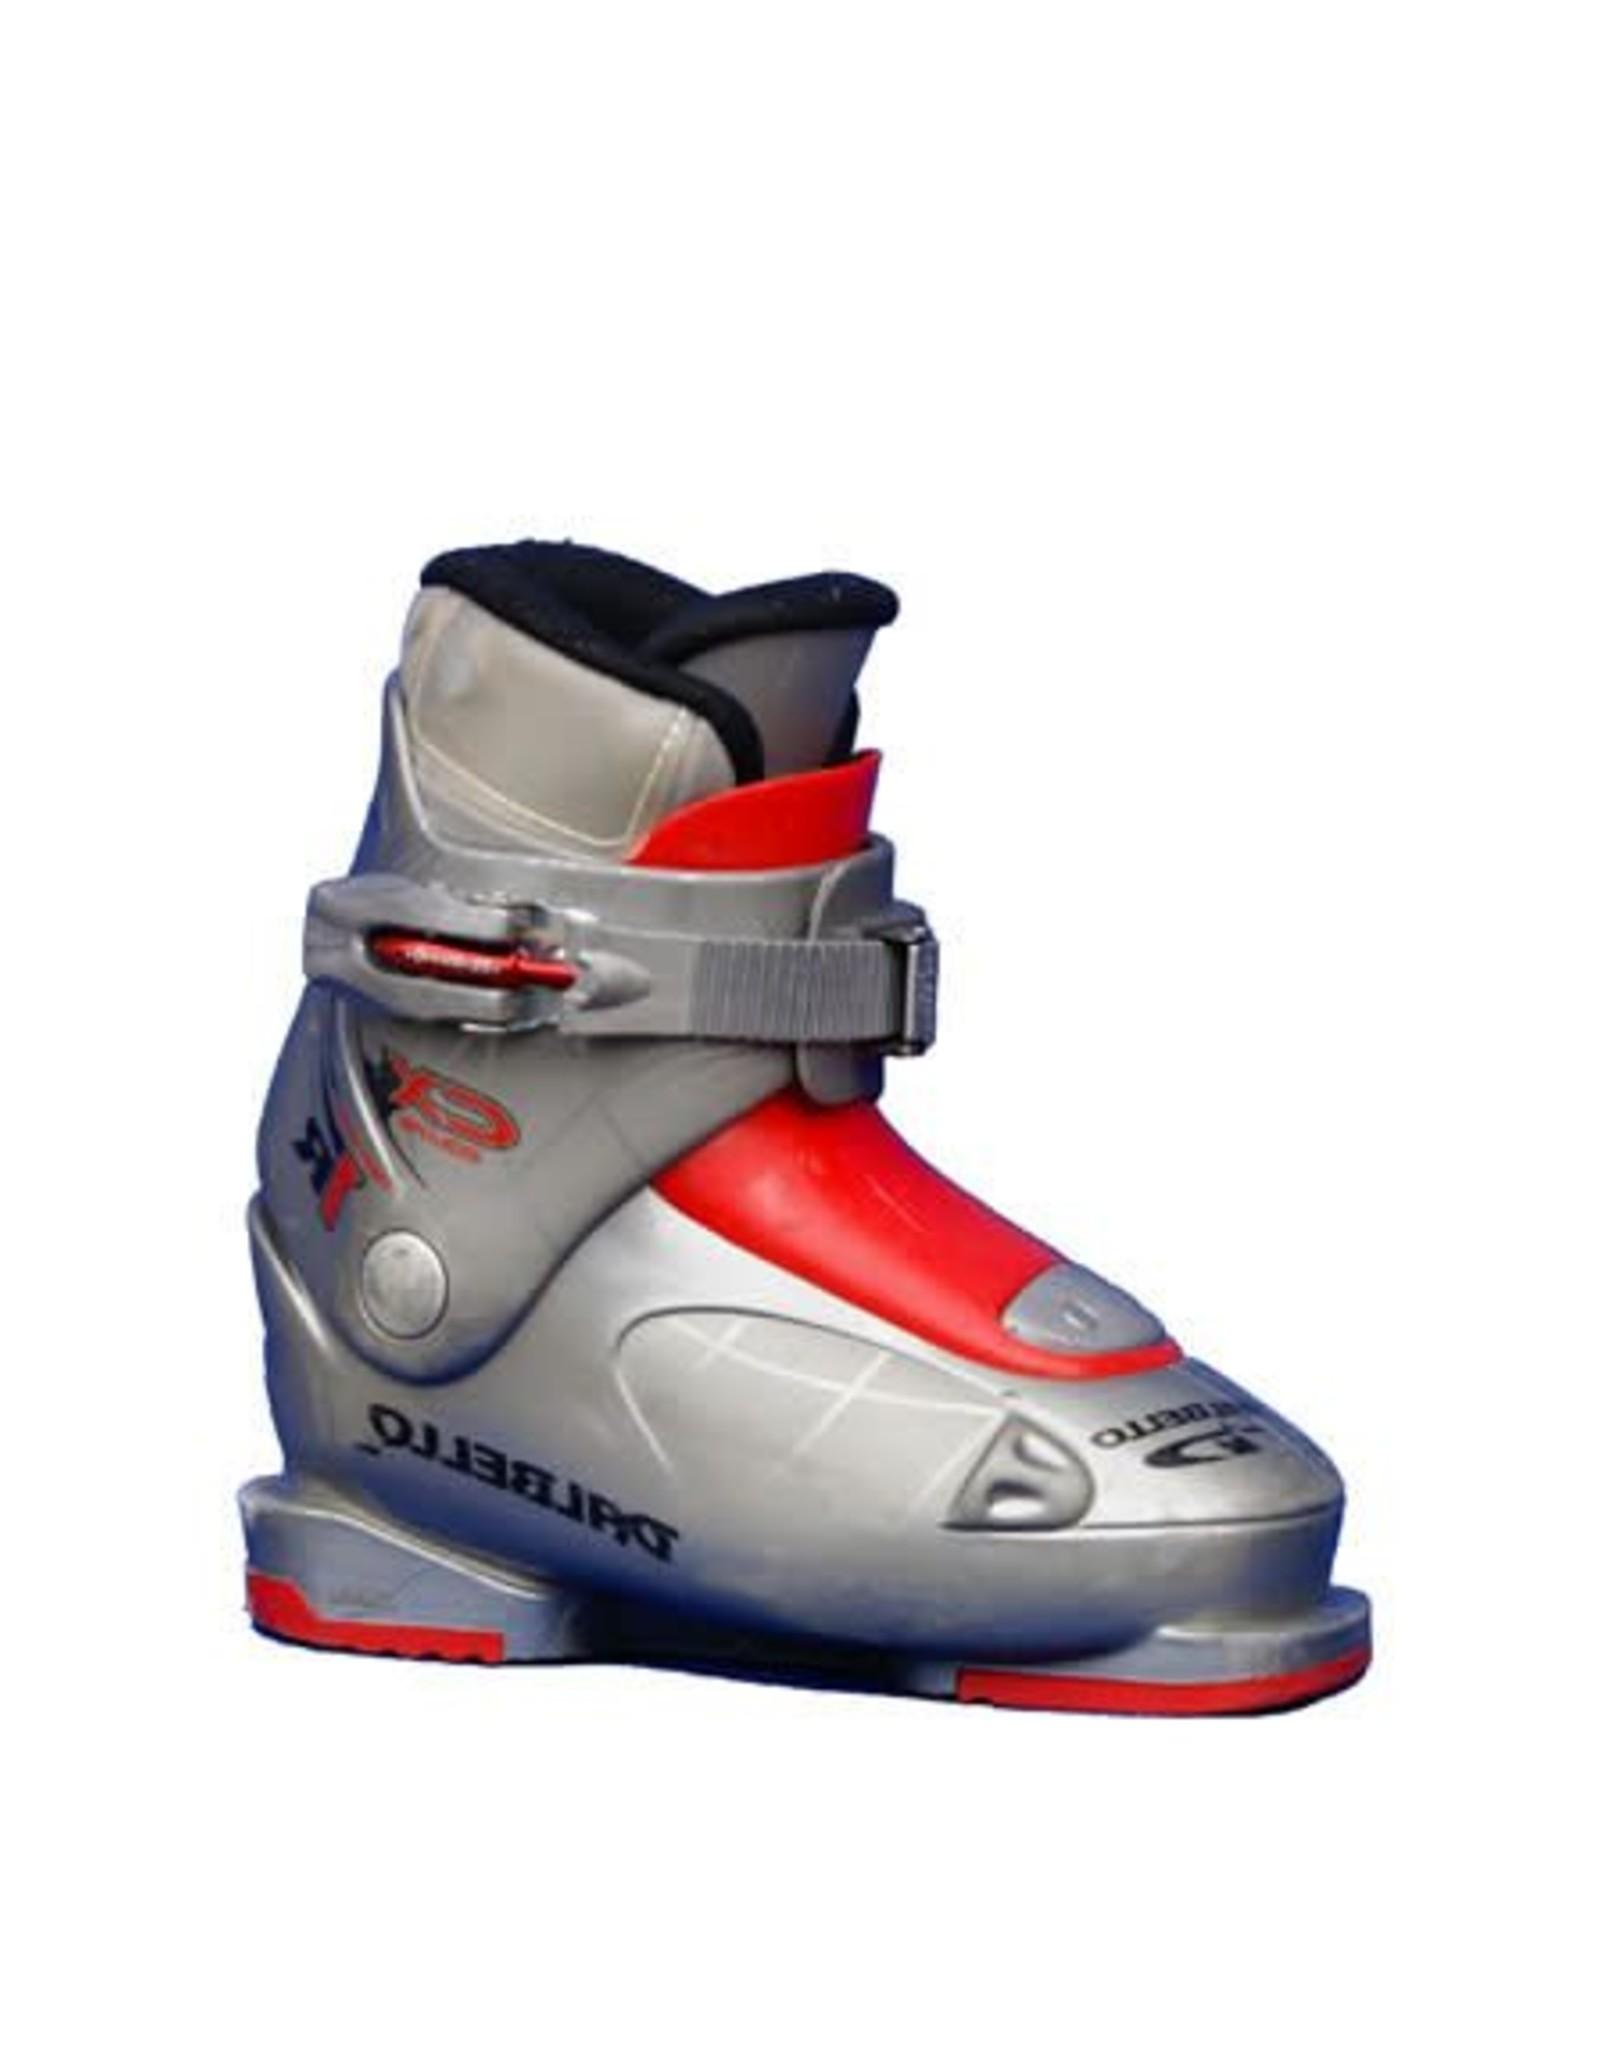 DALBELLO Skischoenen DALBELLO CX Equipe R1 Gebruikt